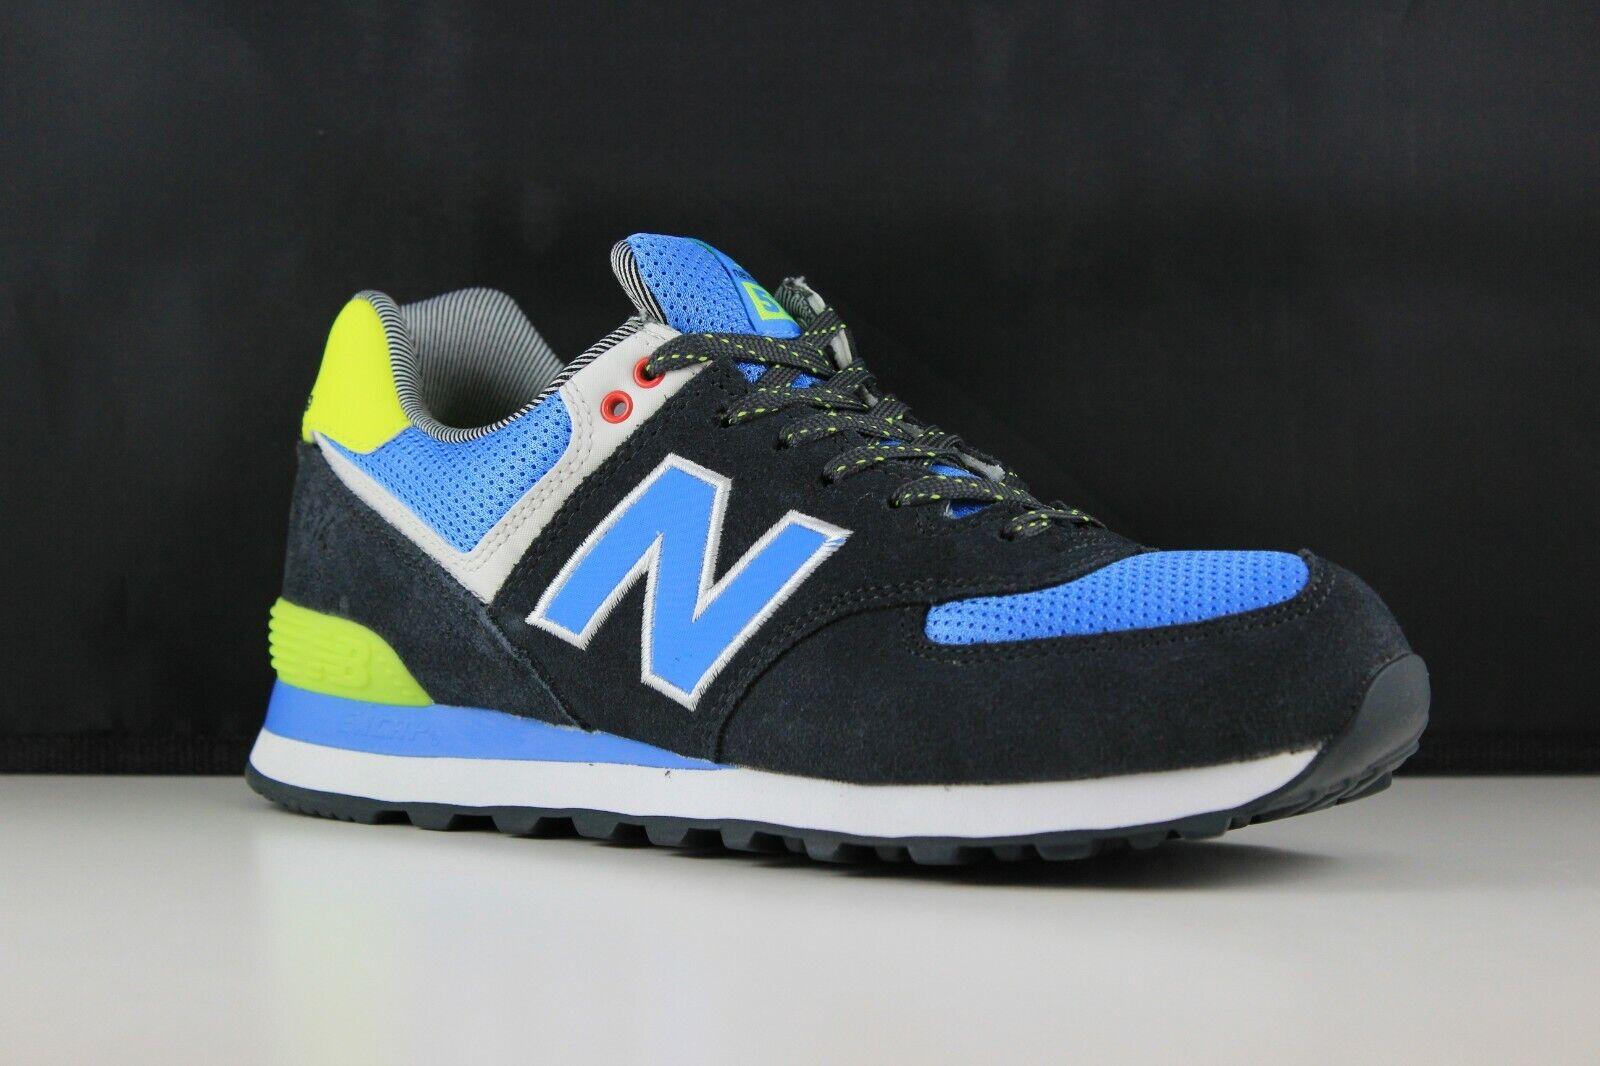 New Balance ML574YCN Size 9 Navy Light bluee Neon